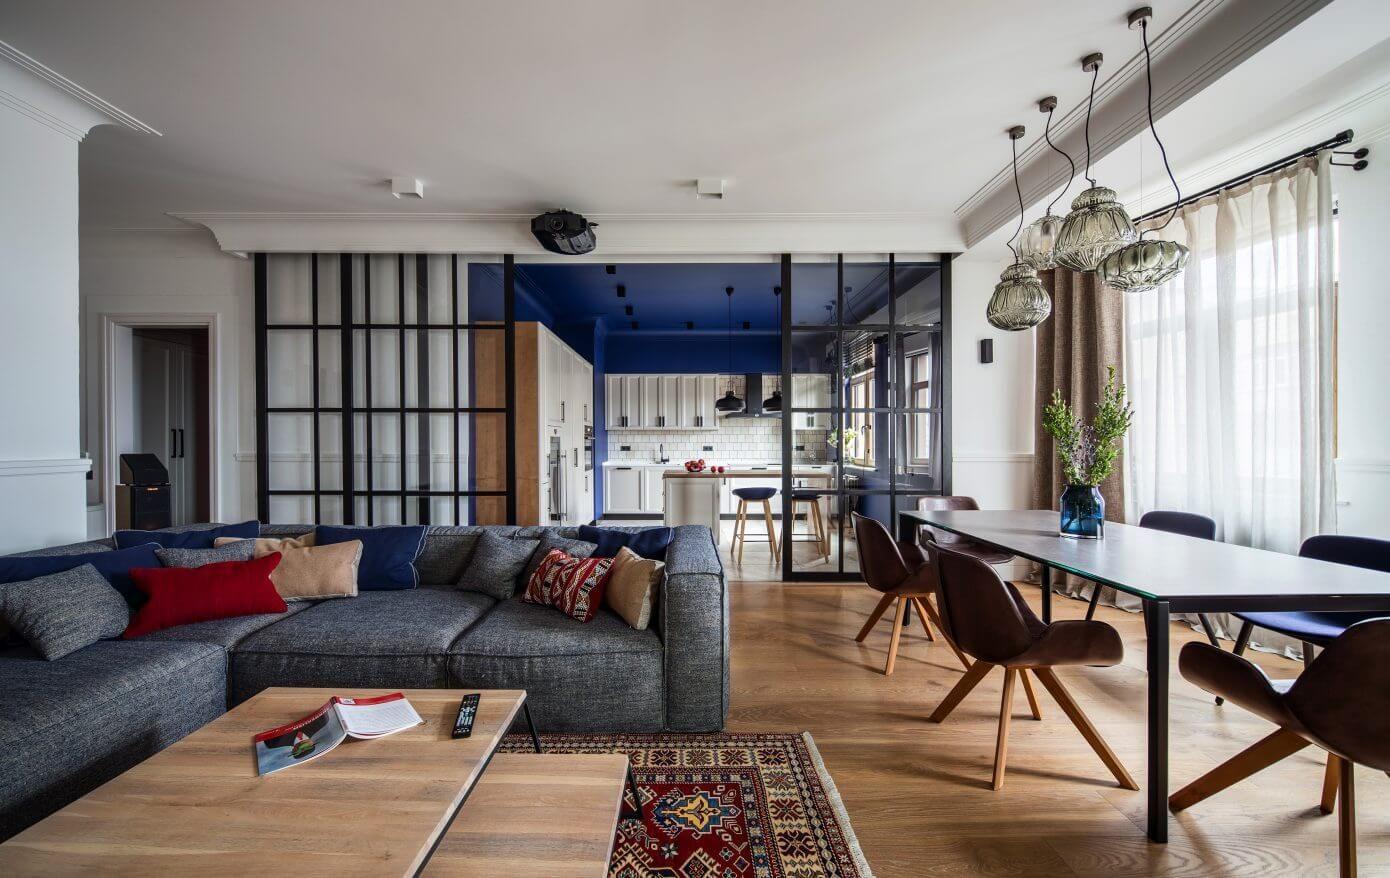 Alise Apartment by Oksana Dolgopiatova HomeAdore